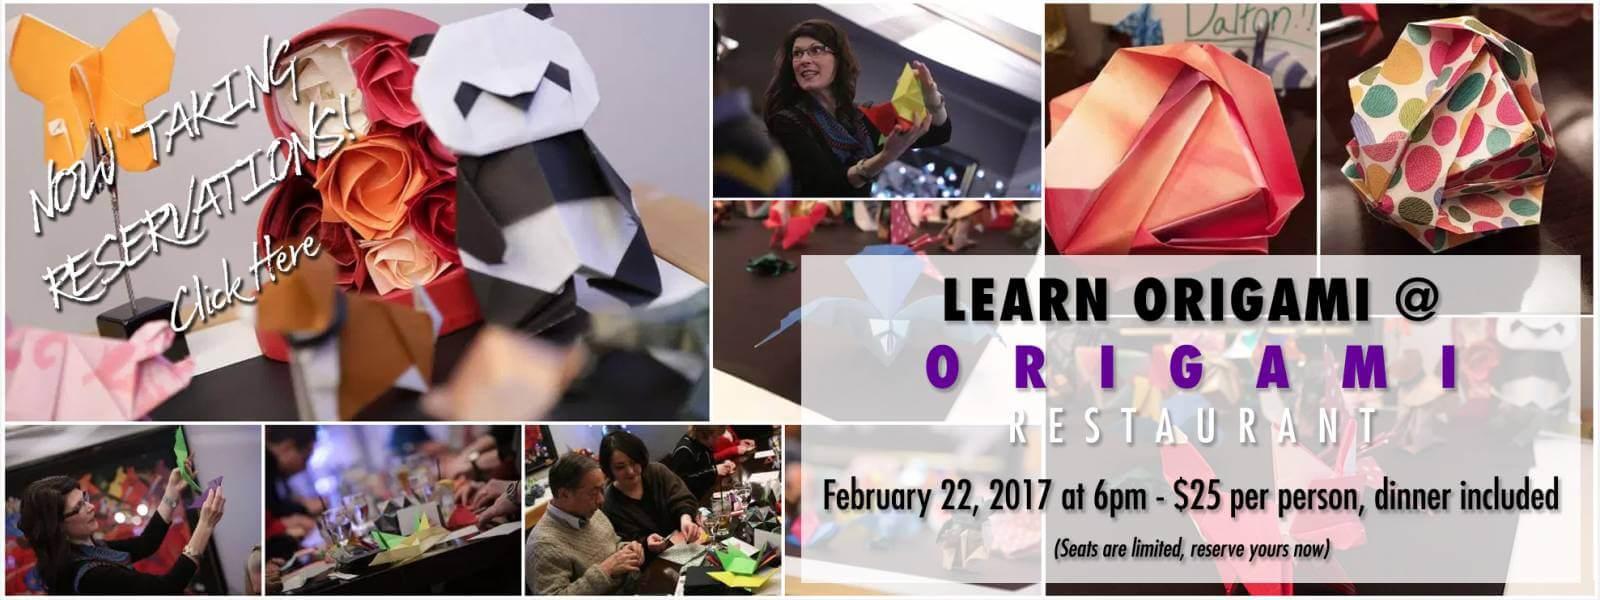 Learn Origami At Origami – February 22, 2017